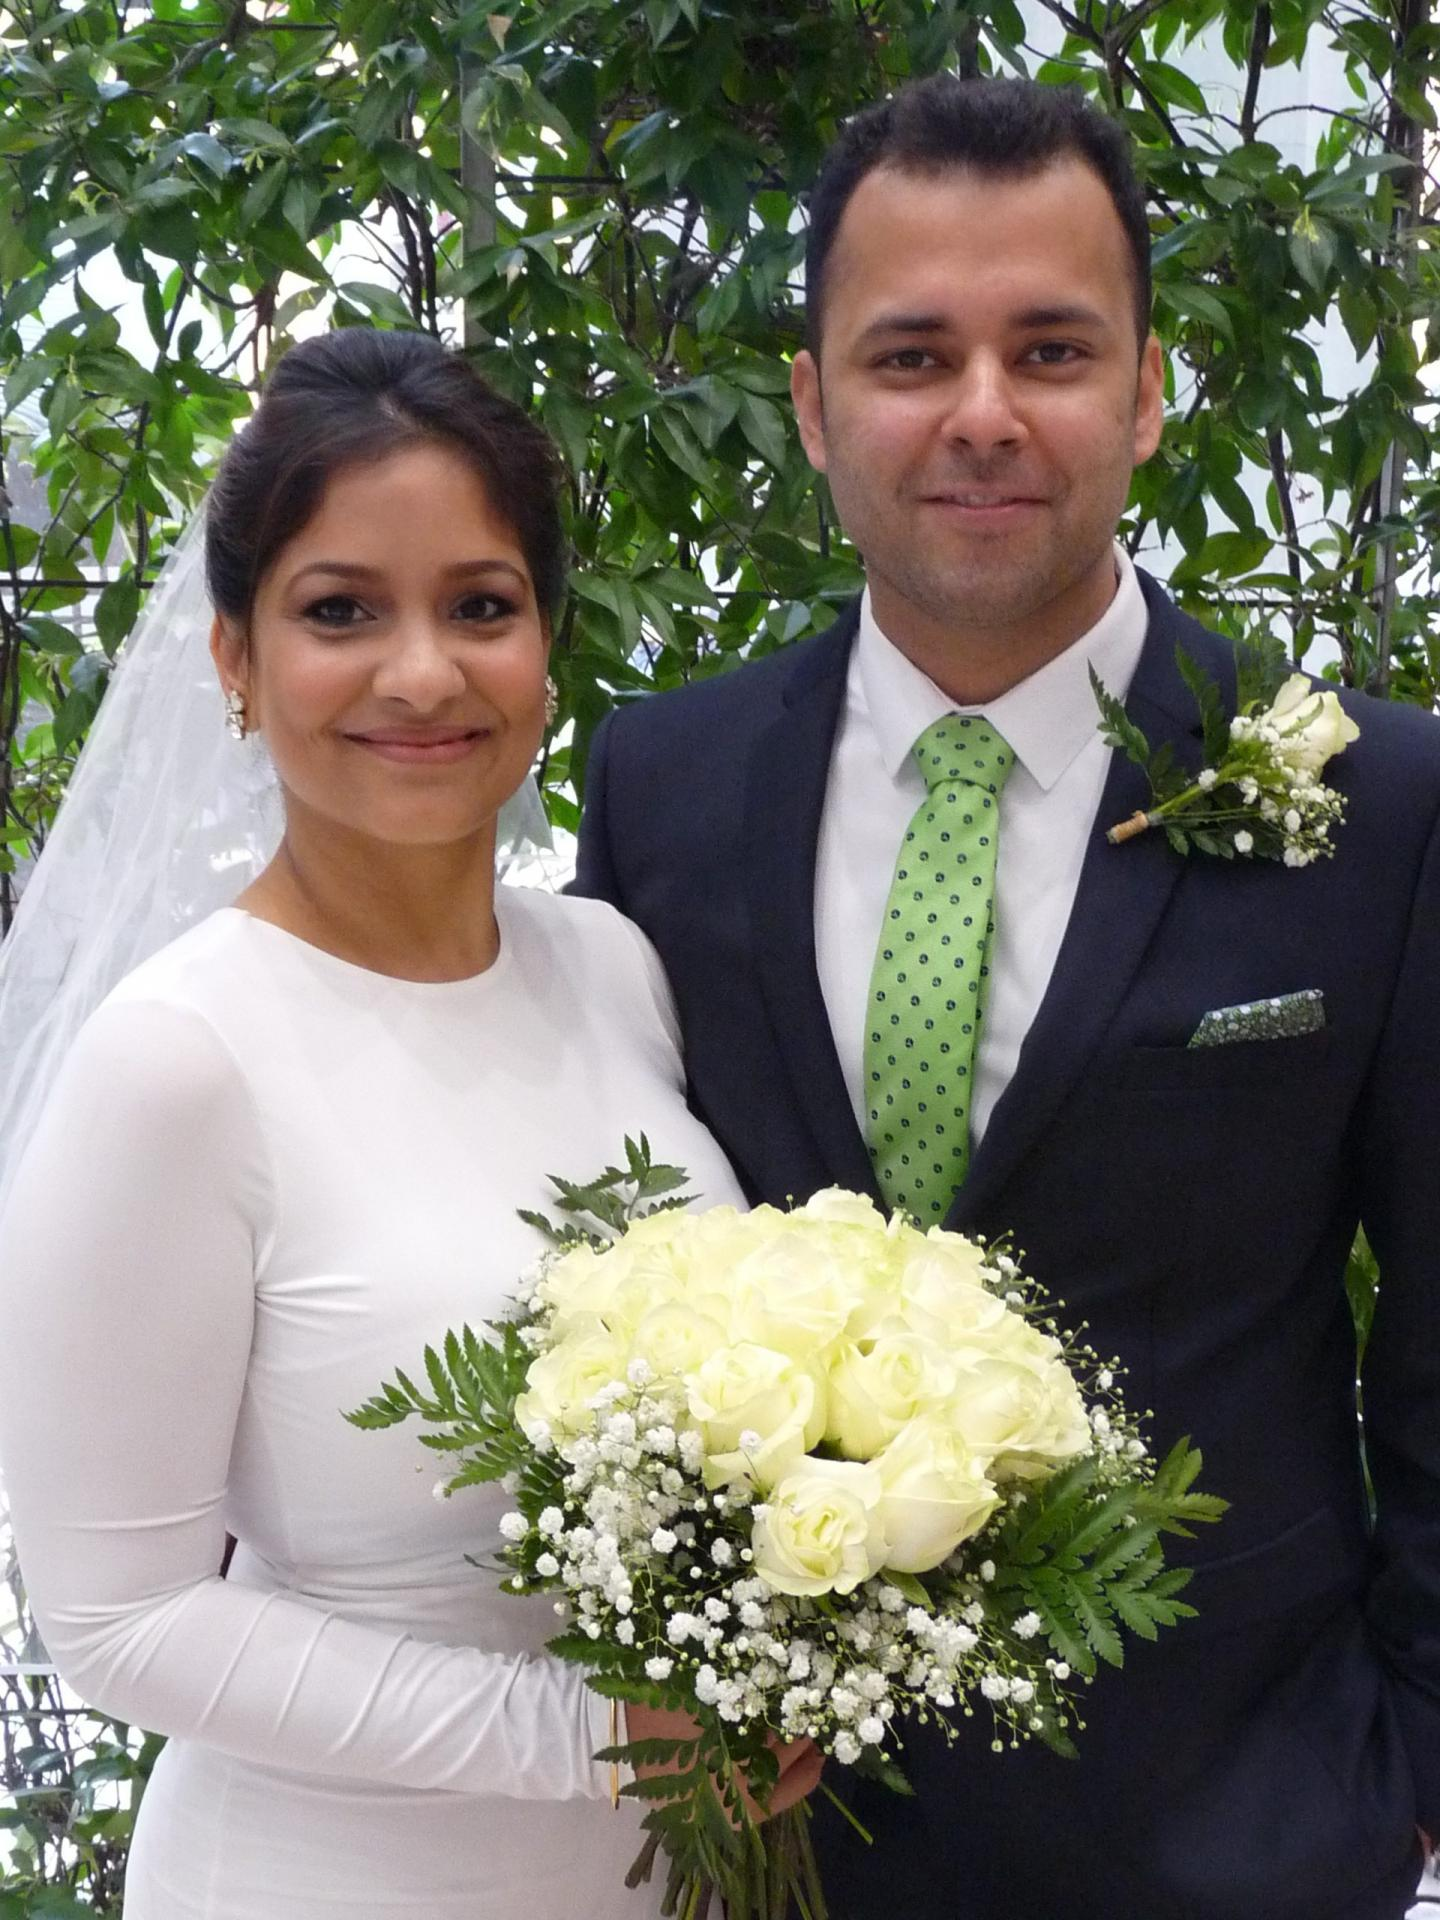 Hema Sati, assistante marketing, et Yash Mehra, conseiller financier.